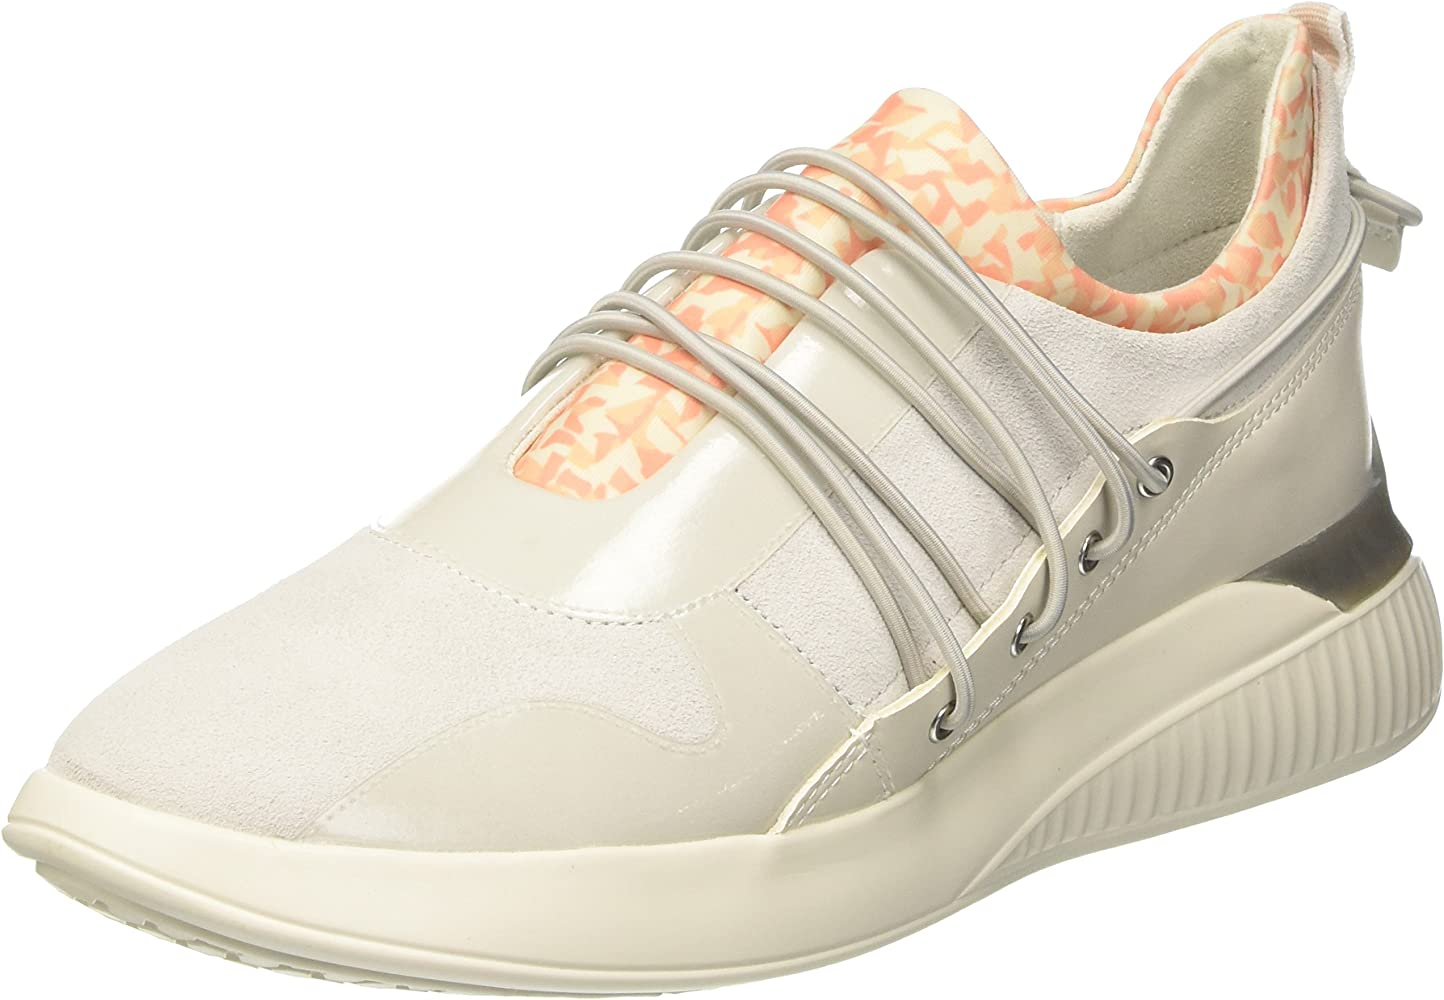 Misterio Pegajoso dígito  Geox D Theragon A, Zapatillas para Mujer, Blanco (Off White), 36 ...